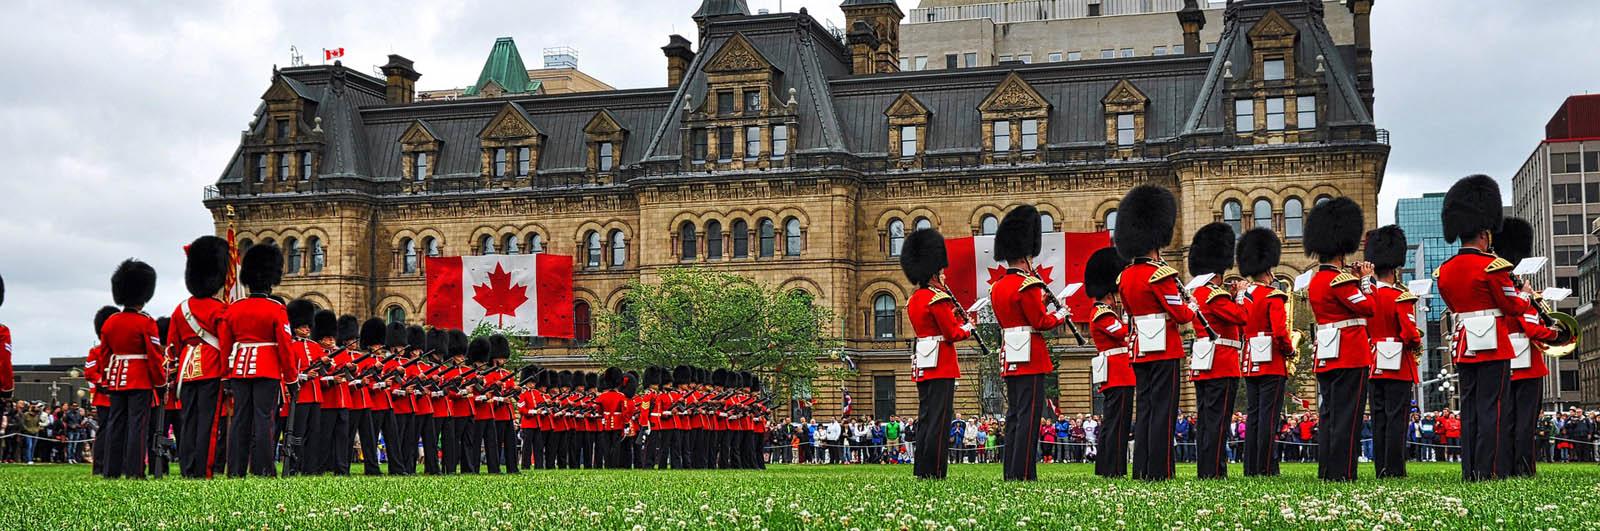 Ottawa- Parliament Hill - Changing of the Guard - (David L)-sliver